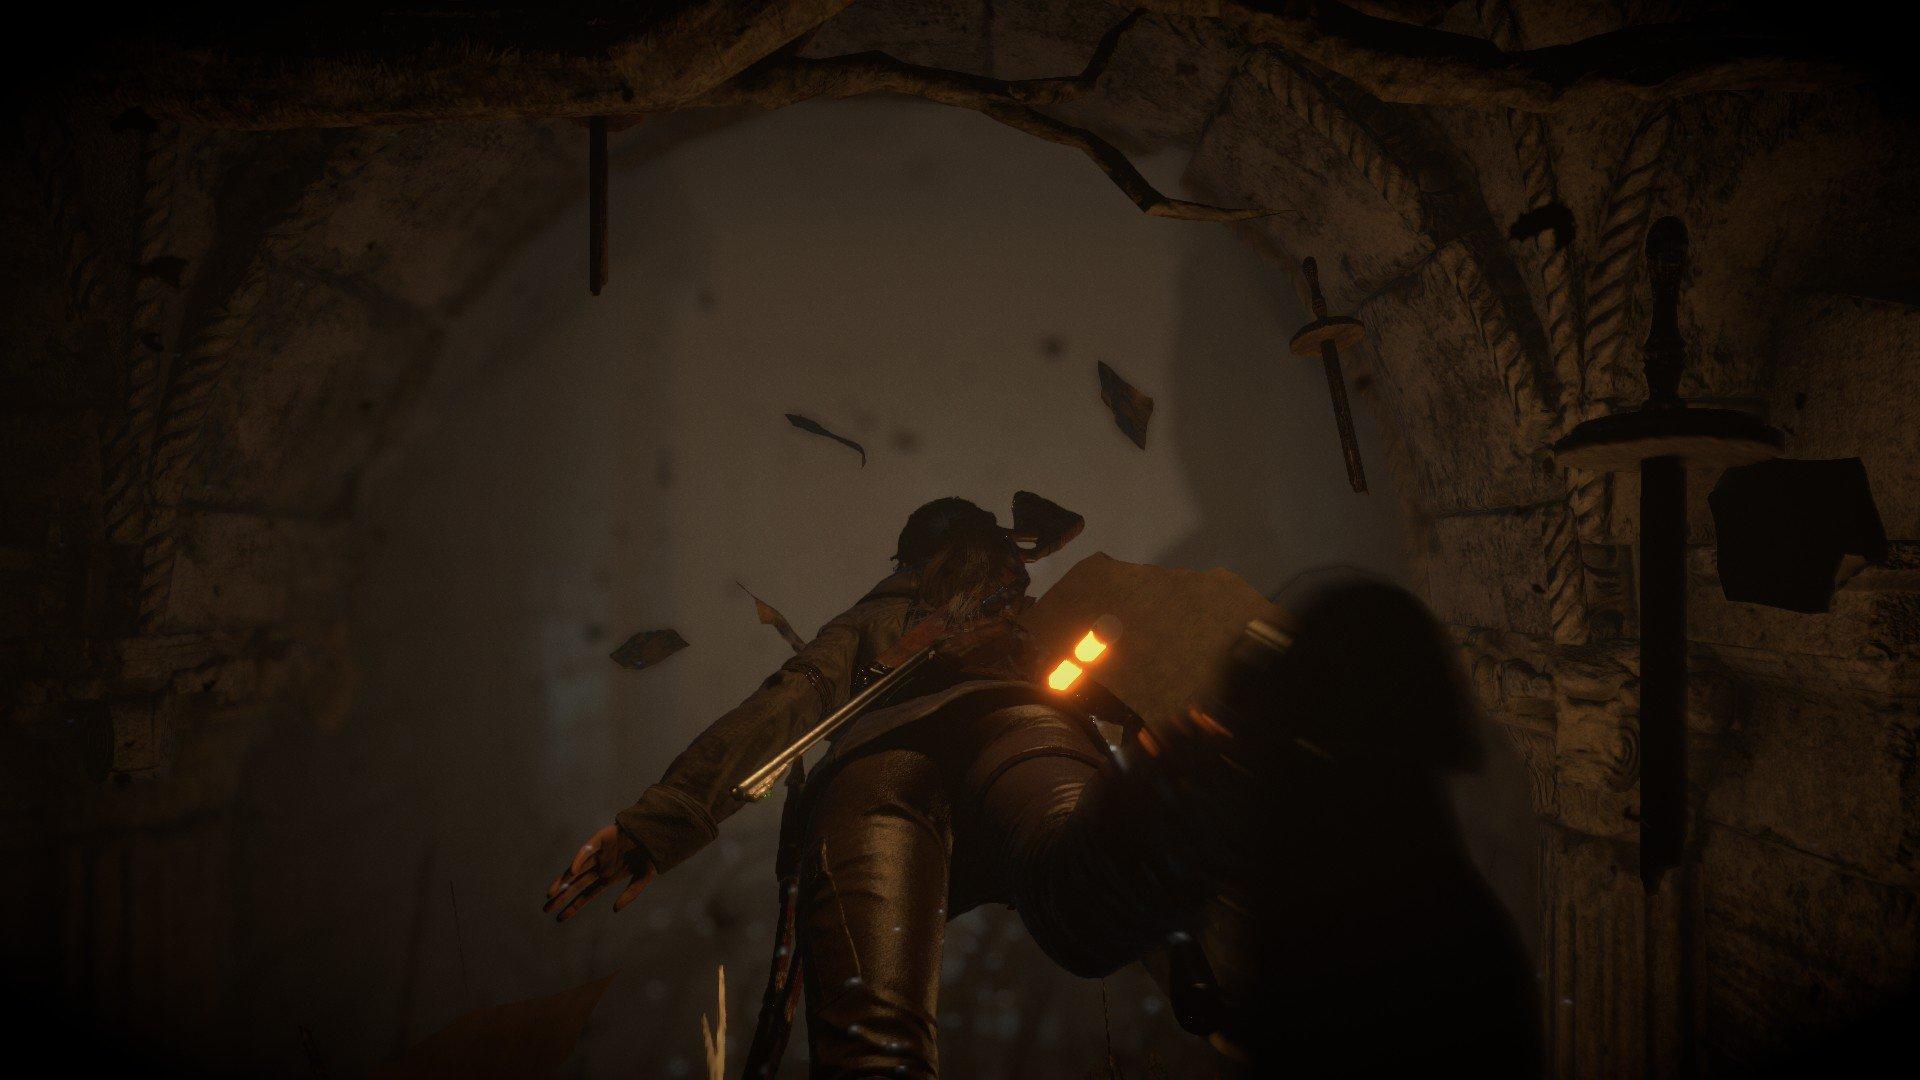 Rise of the Tomb Raider или да когда же этот медведь сдохнет?. - Изображение 26